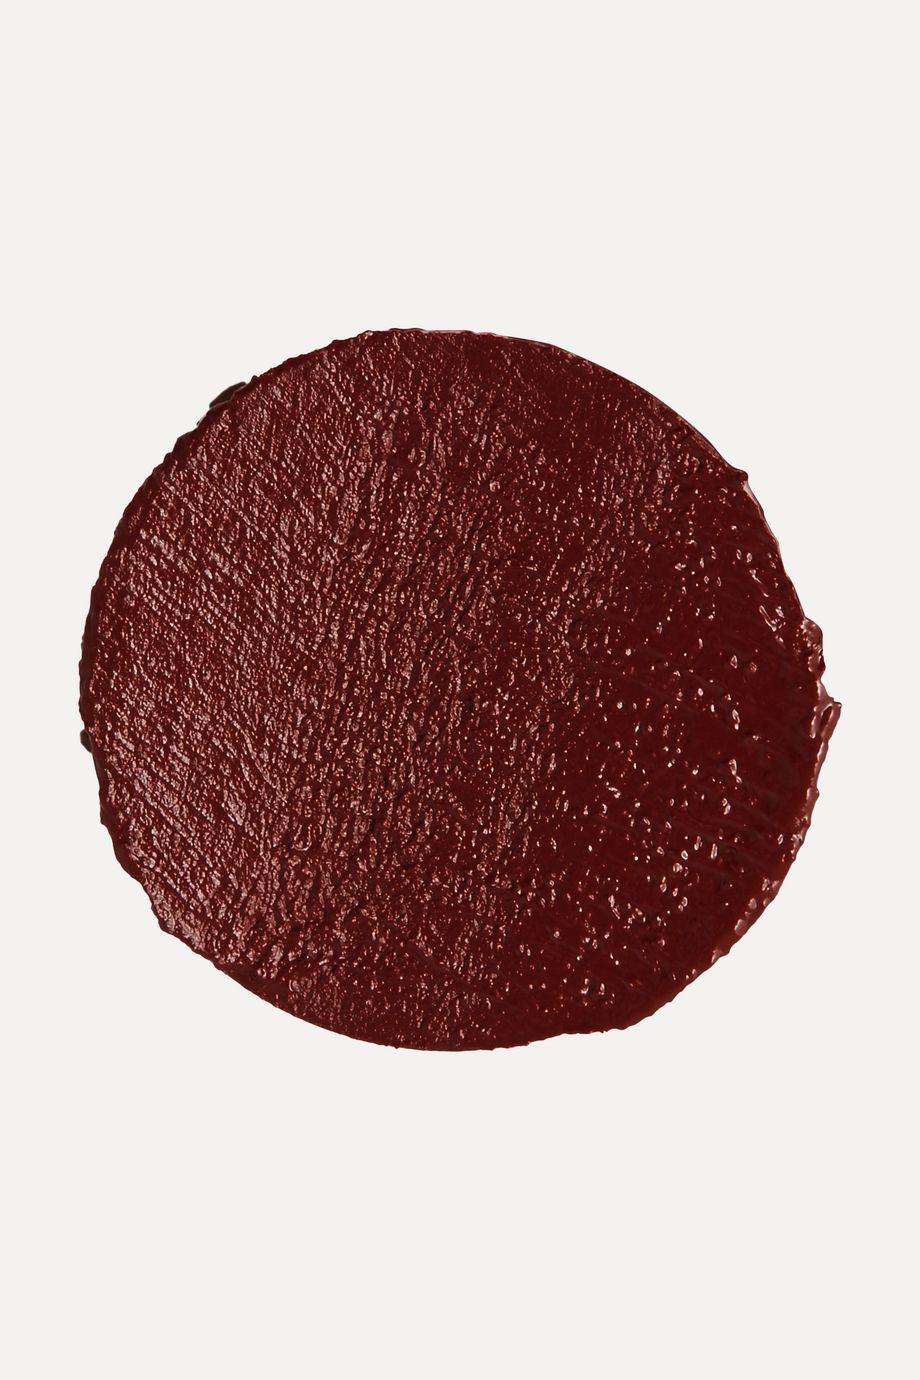 Burberry Beauty Full Kisses - Oxblood No.549